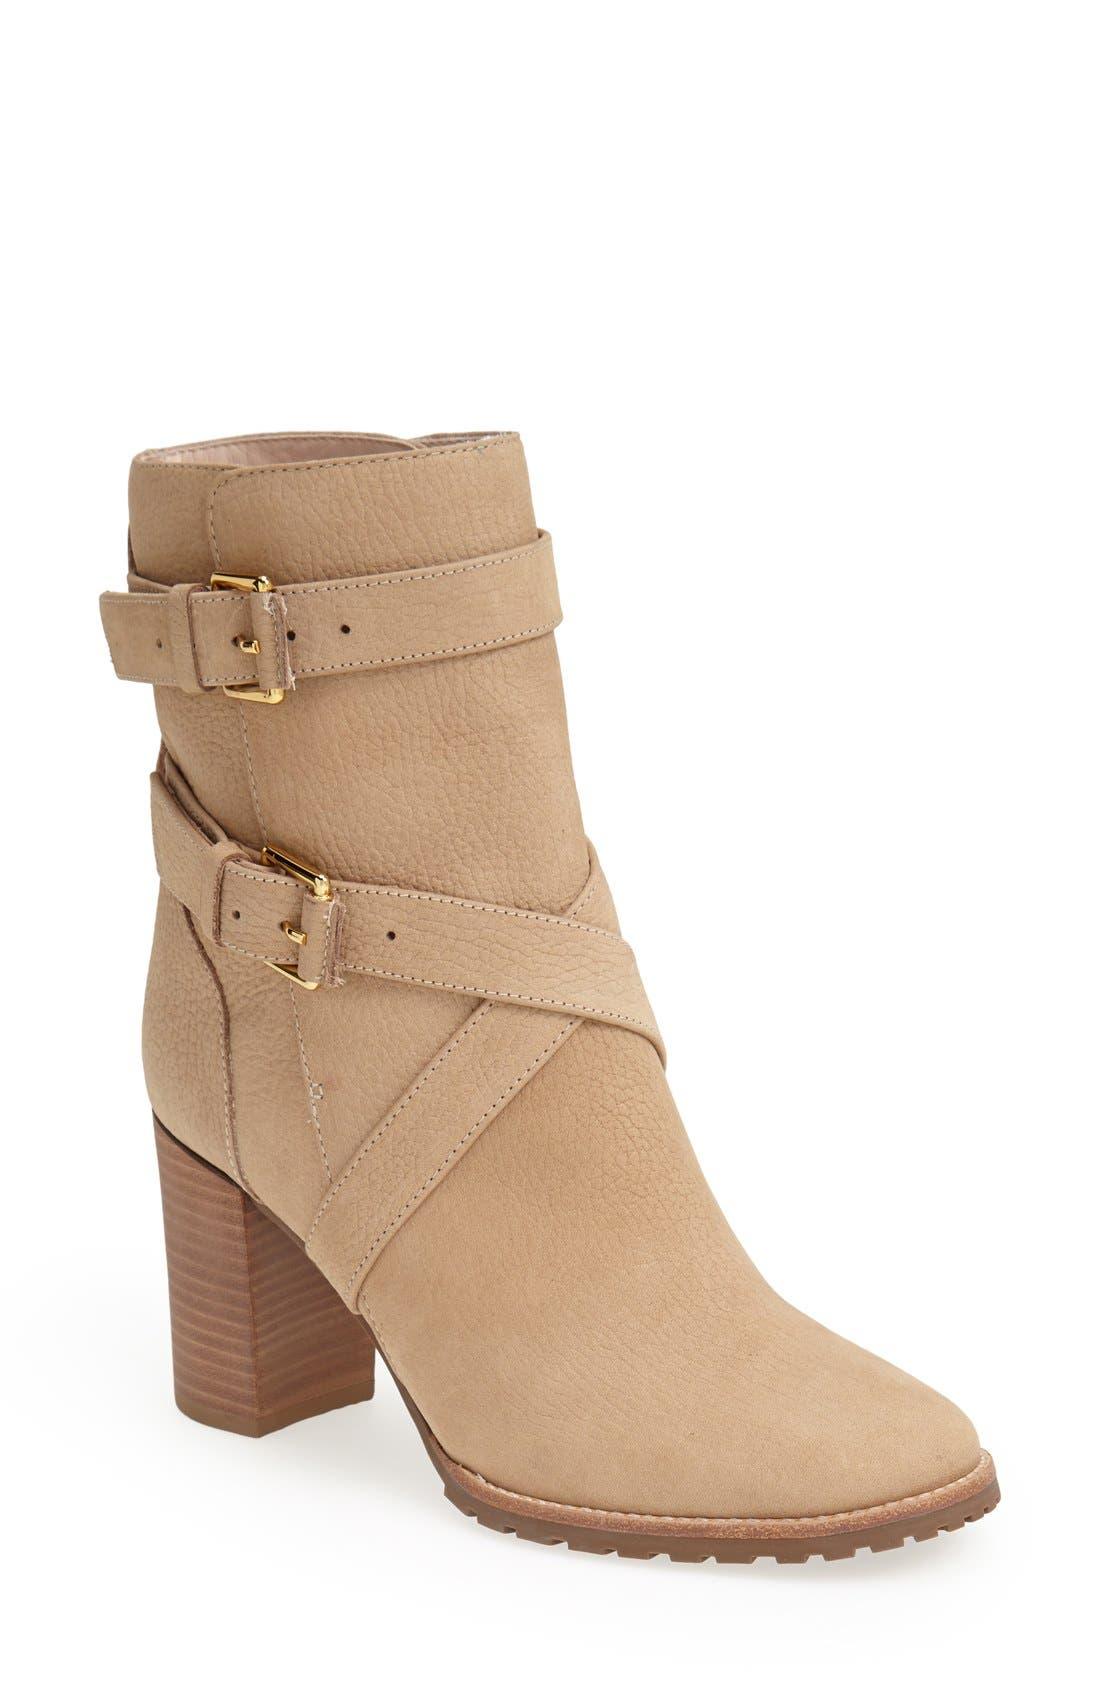 Alternate Image 1 Selected - kate spade new york 'layne' boot (Women)